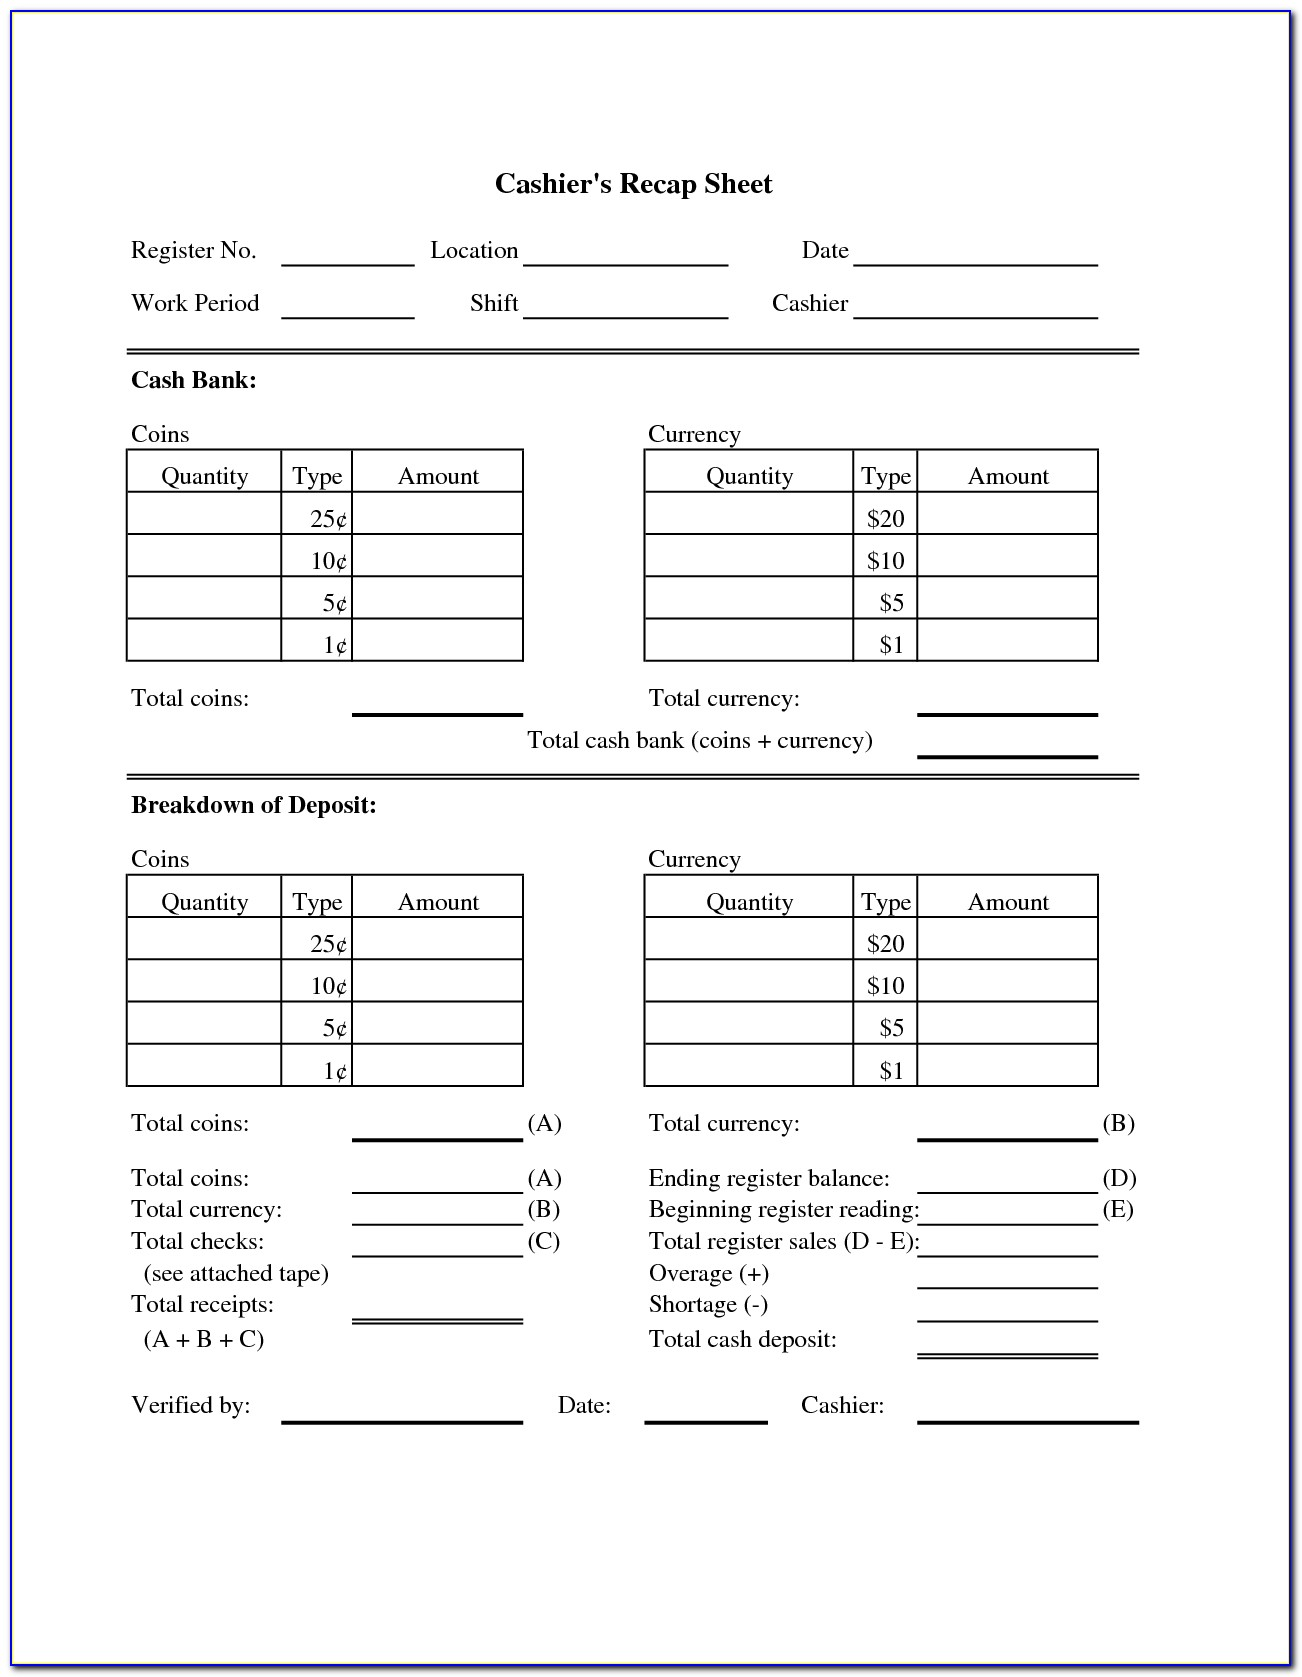 Cash Drawer Reconciliation Form Template